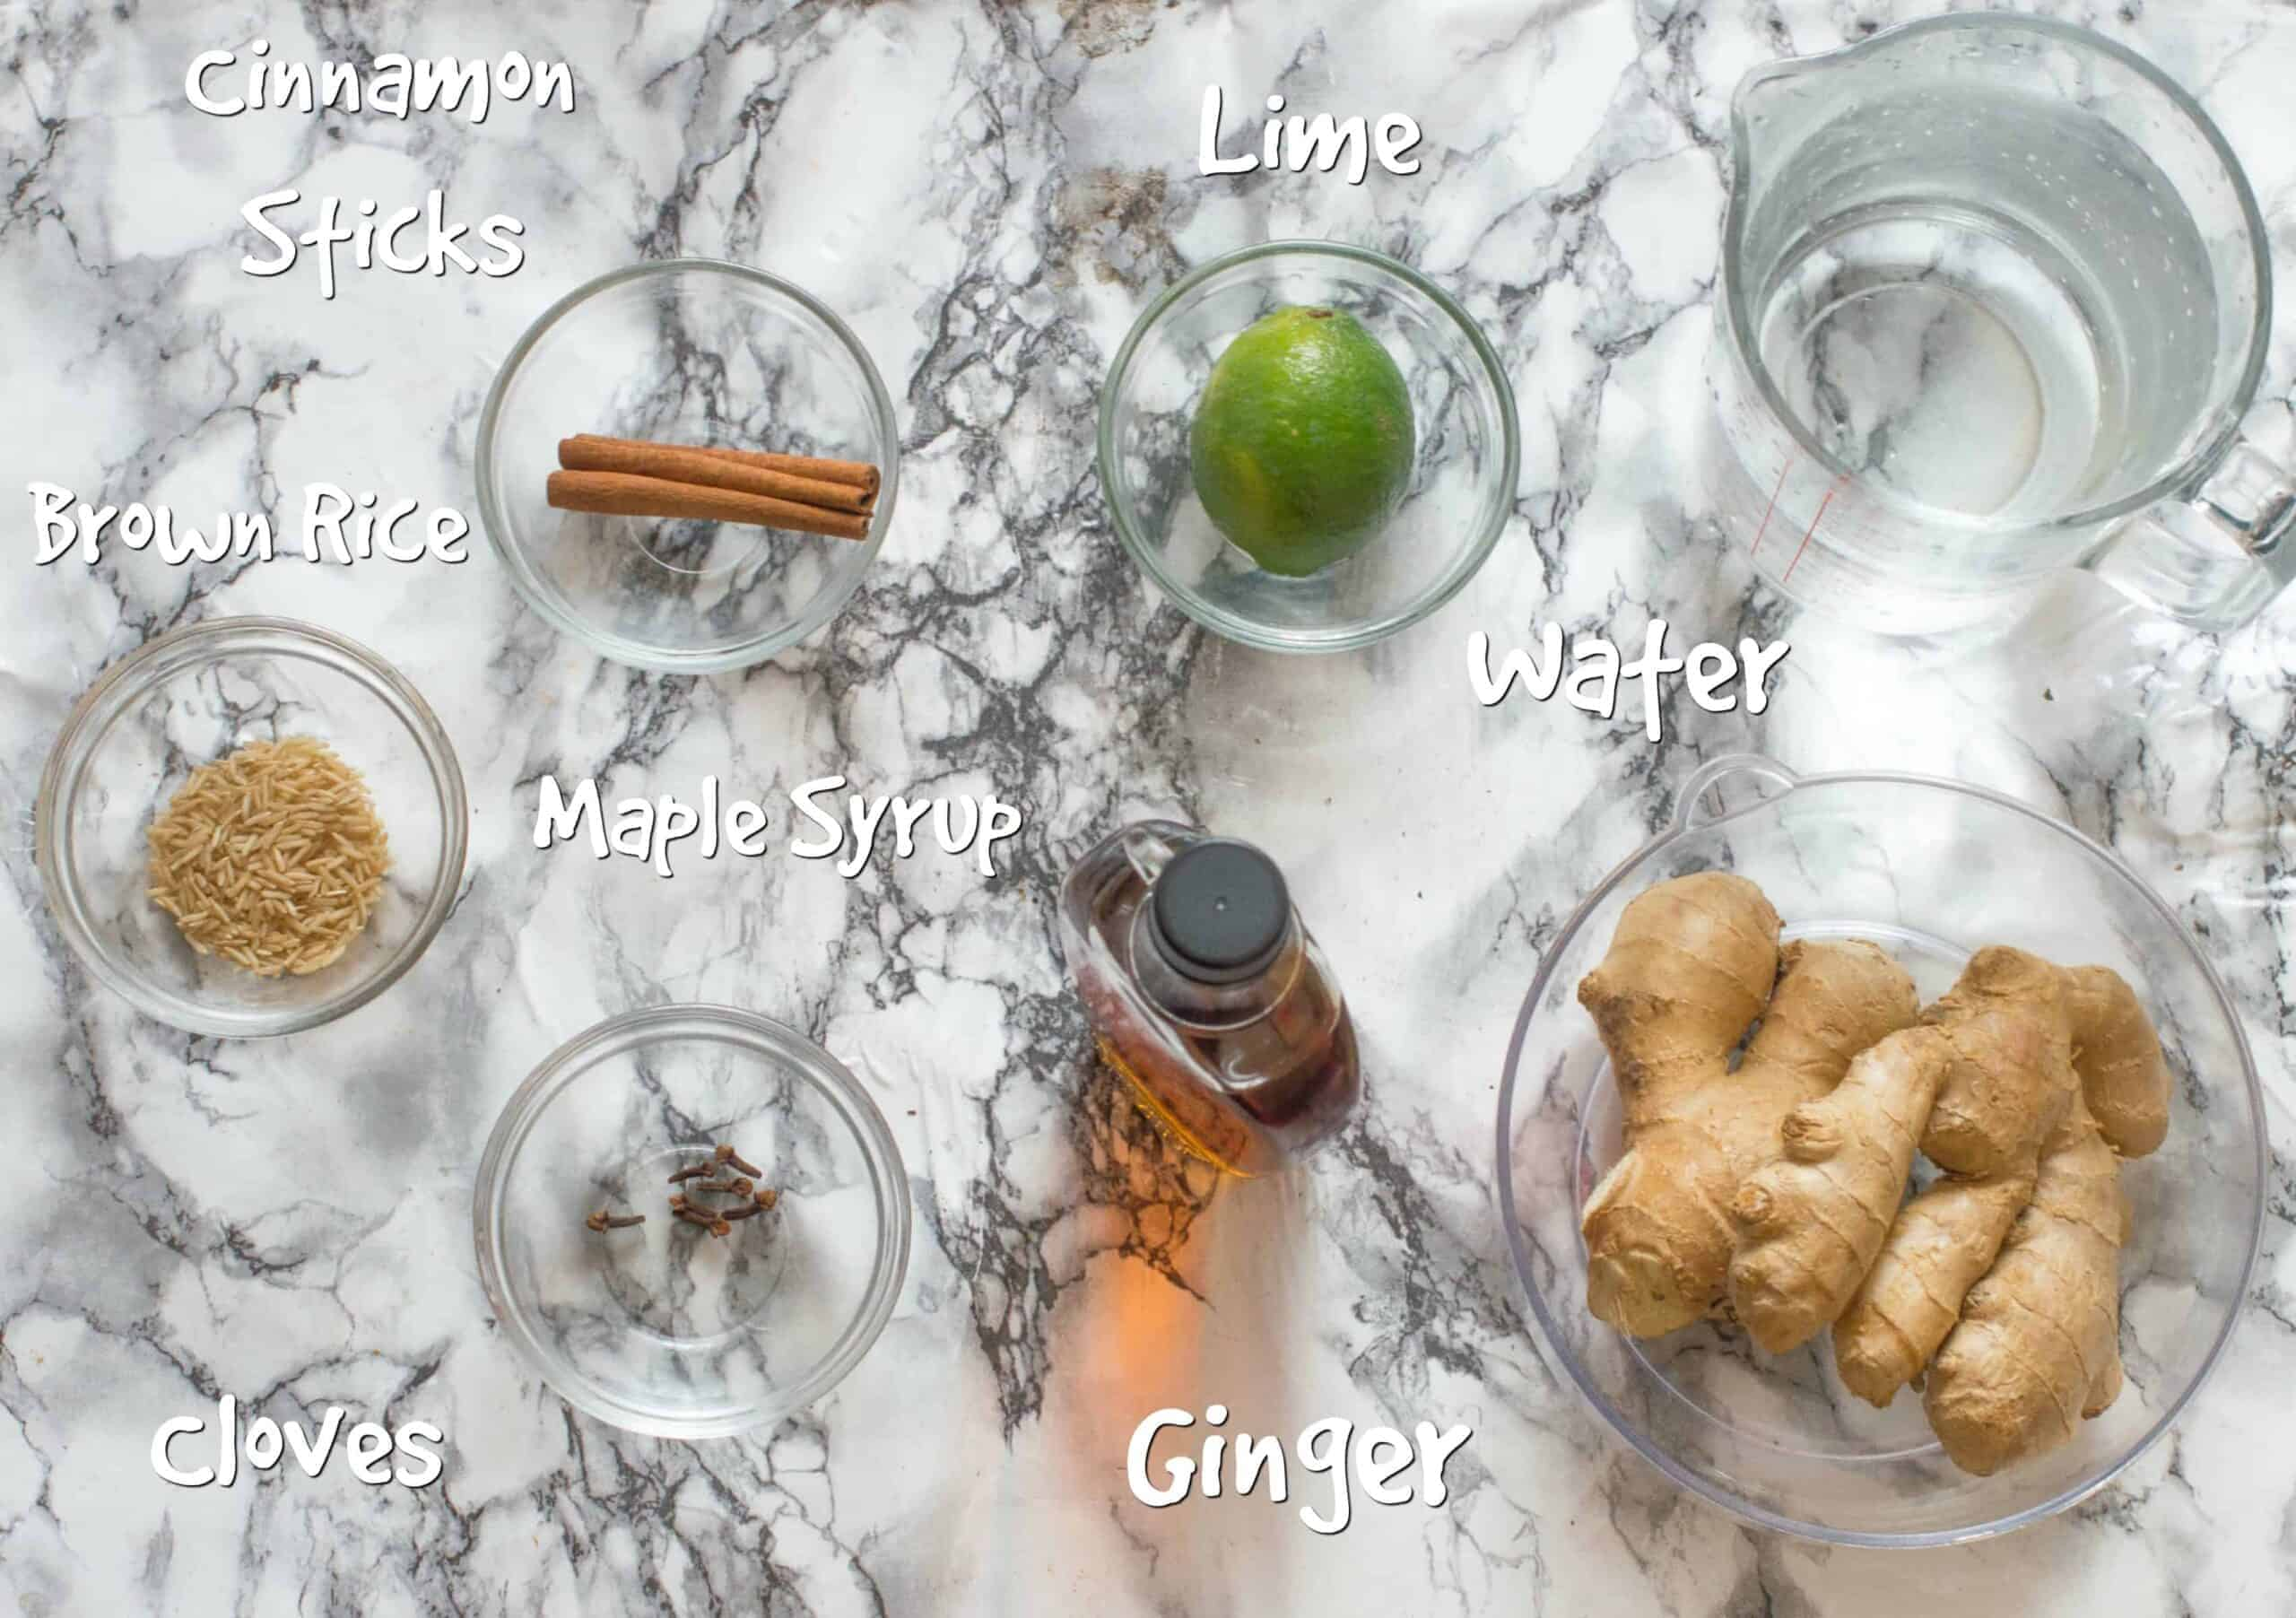 ingredients for jamaican ginger beer